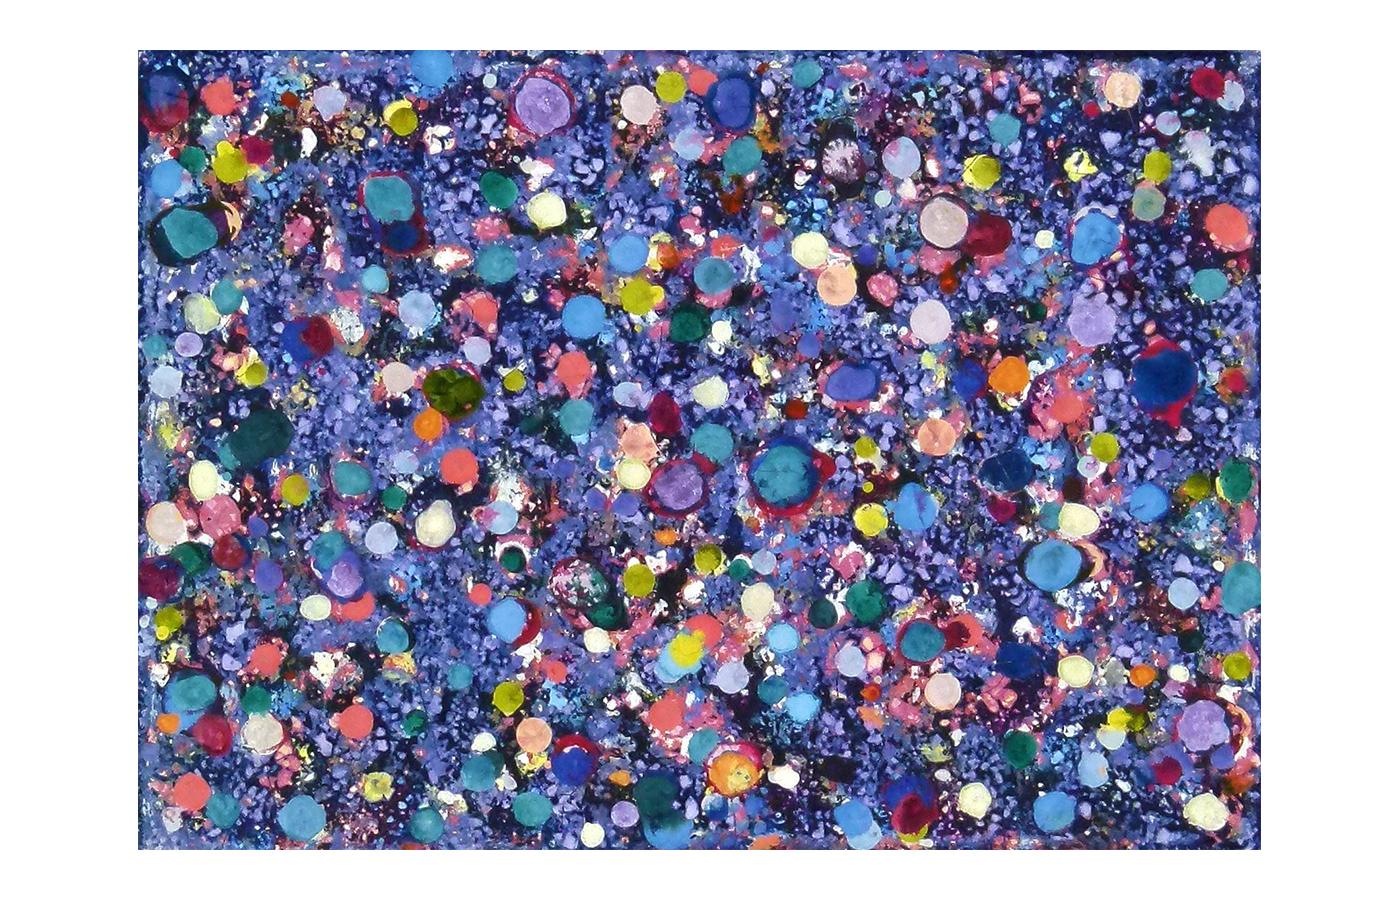 Farbige Tusche auf Leinwand 1_0009_L1100021b